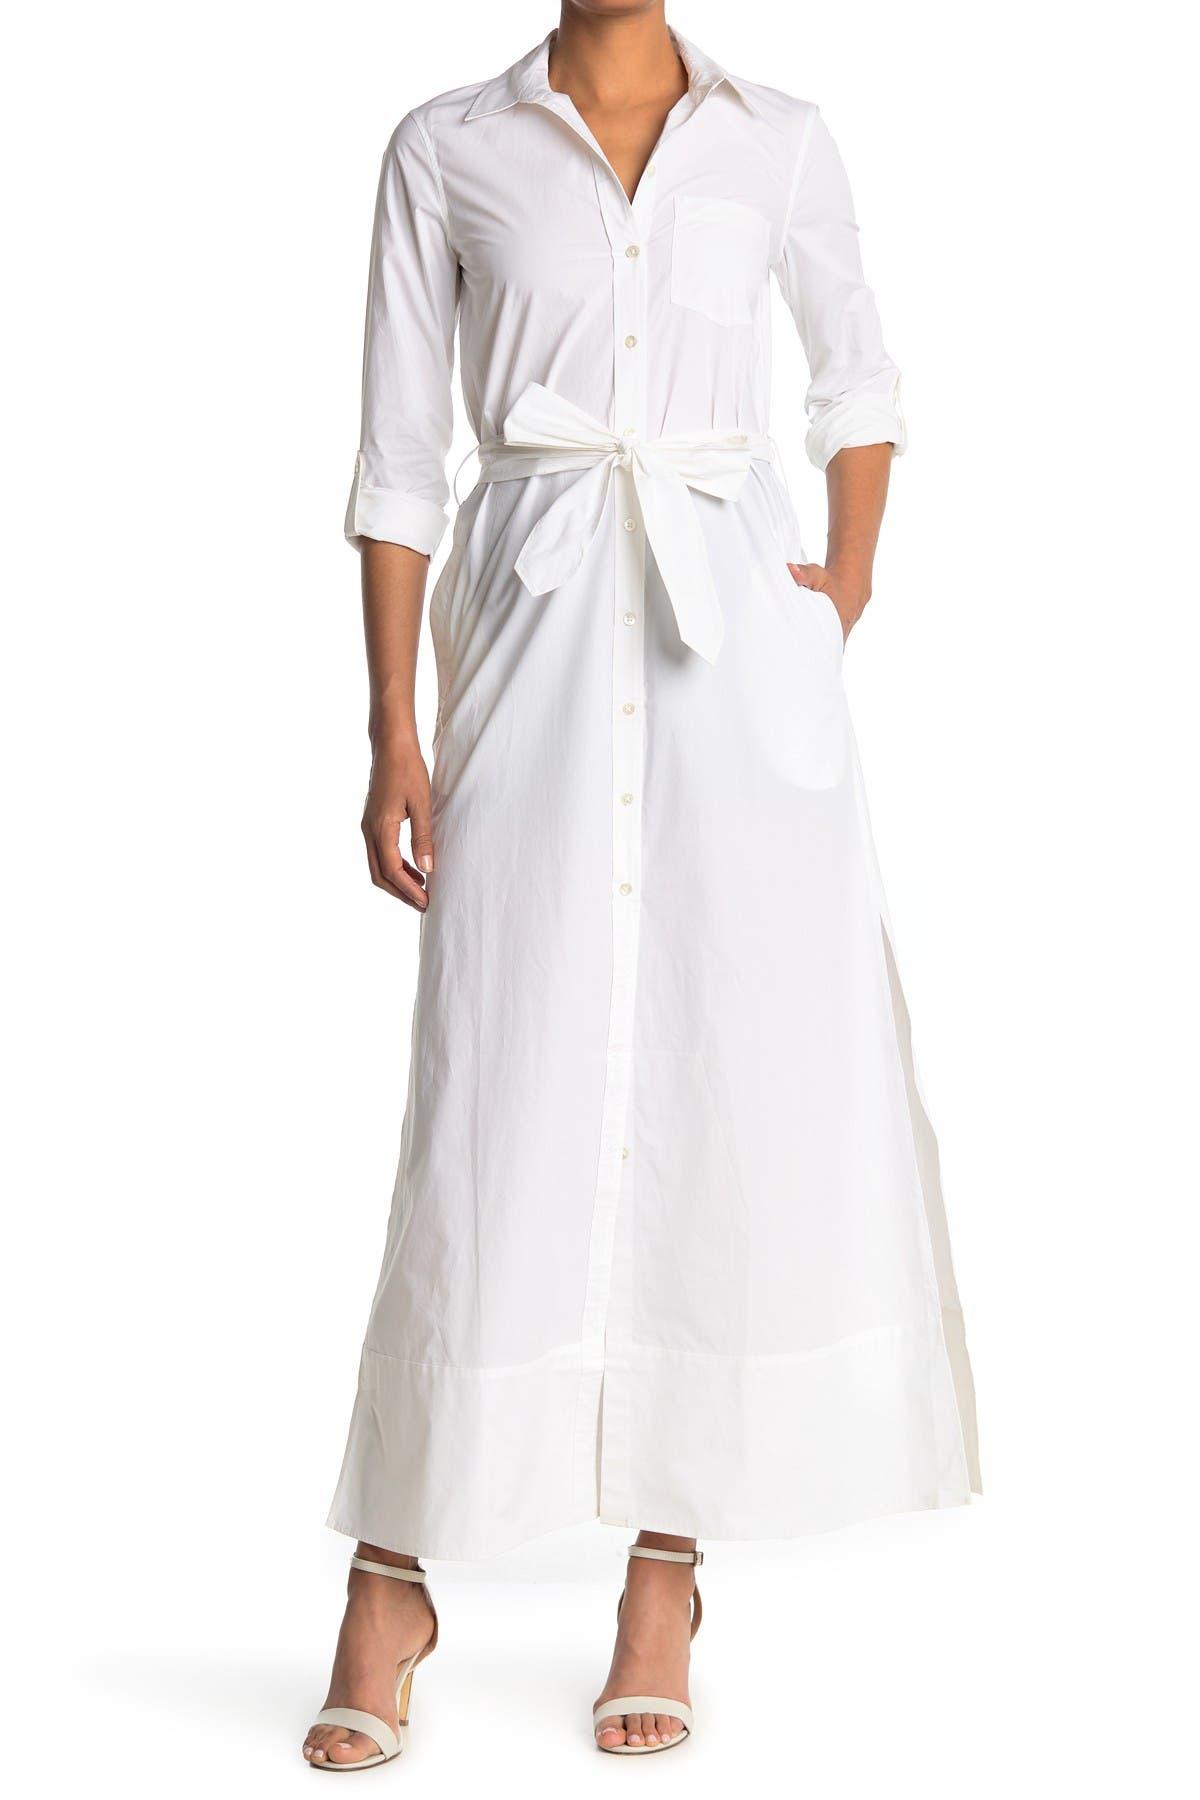 Image of BALDWIN Kerry Waist Tie Maxi Shirt Dress